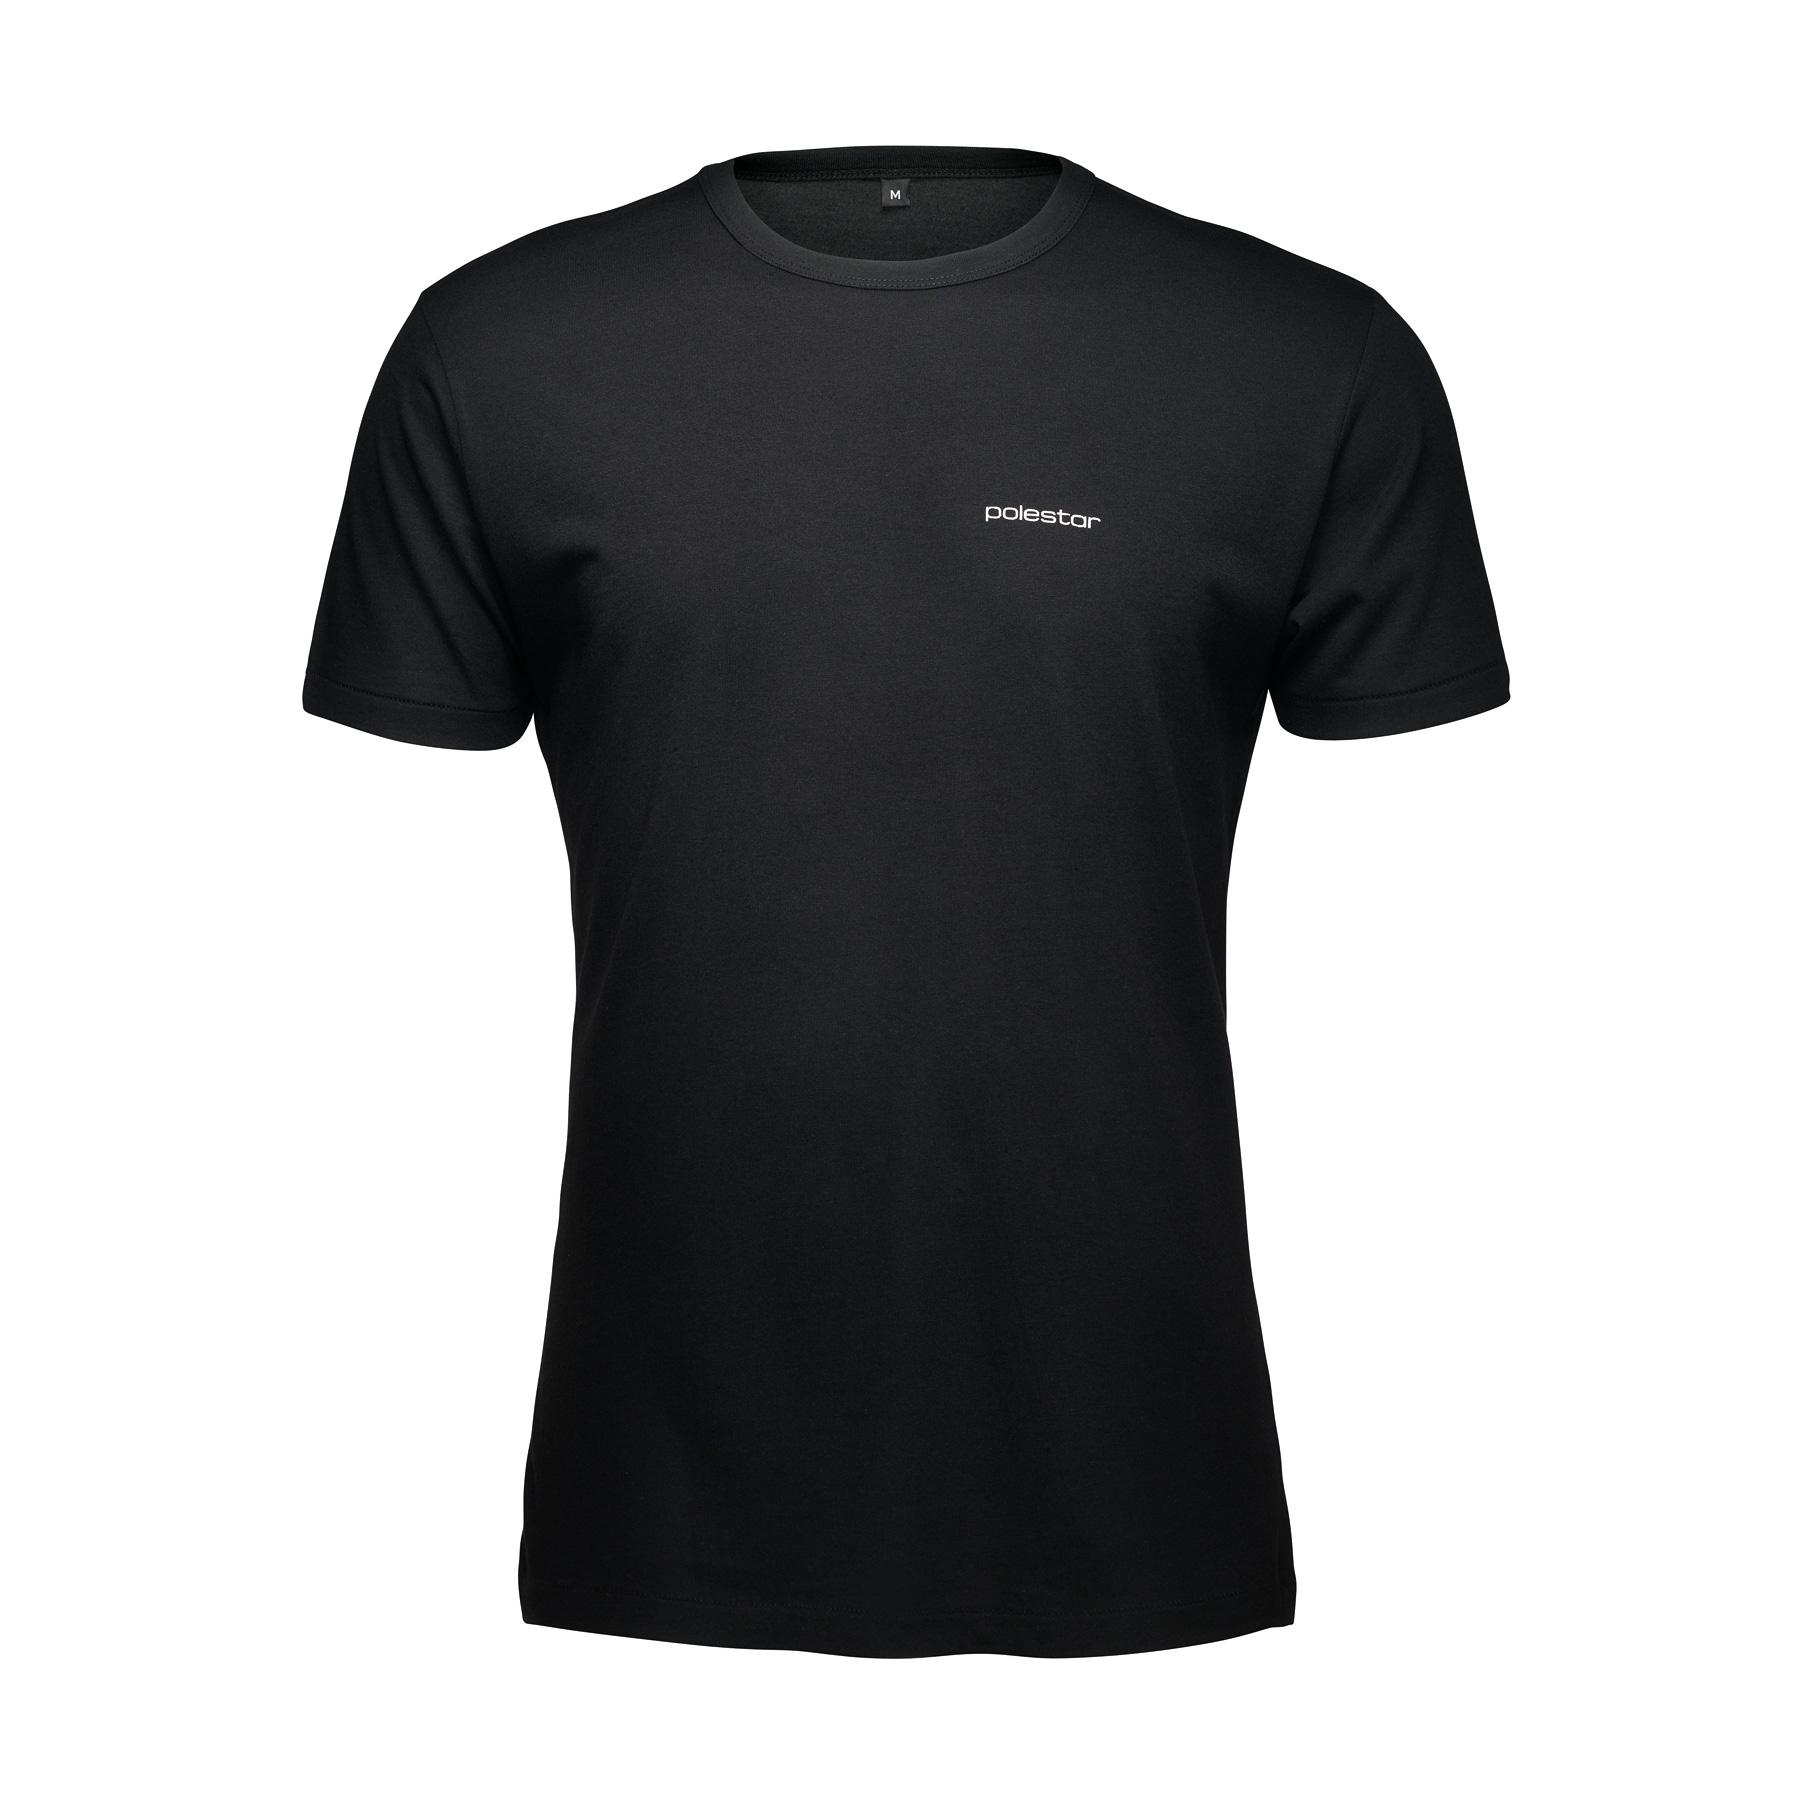 volvo car lifestyle collection shop polestar t shirt. Black Bedroom Furniture Sets. Home Design Ideas